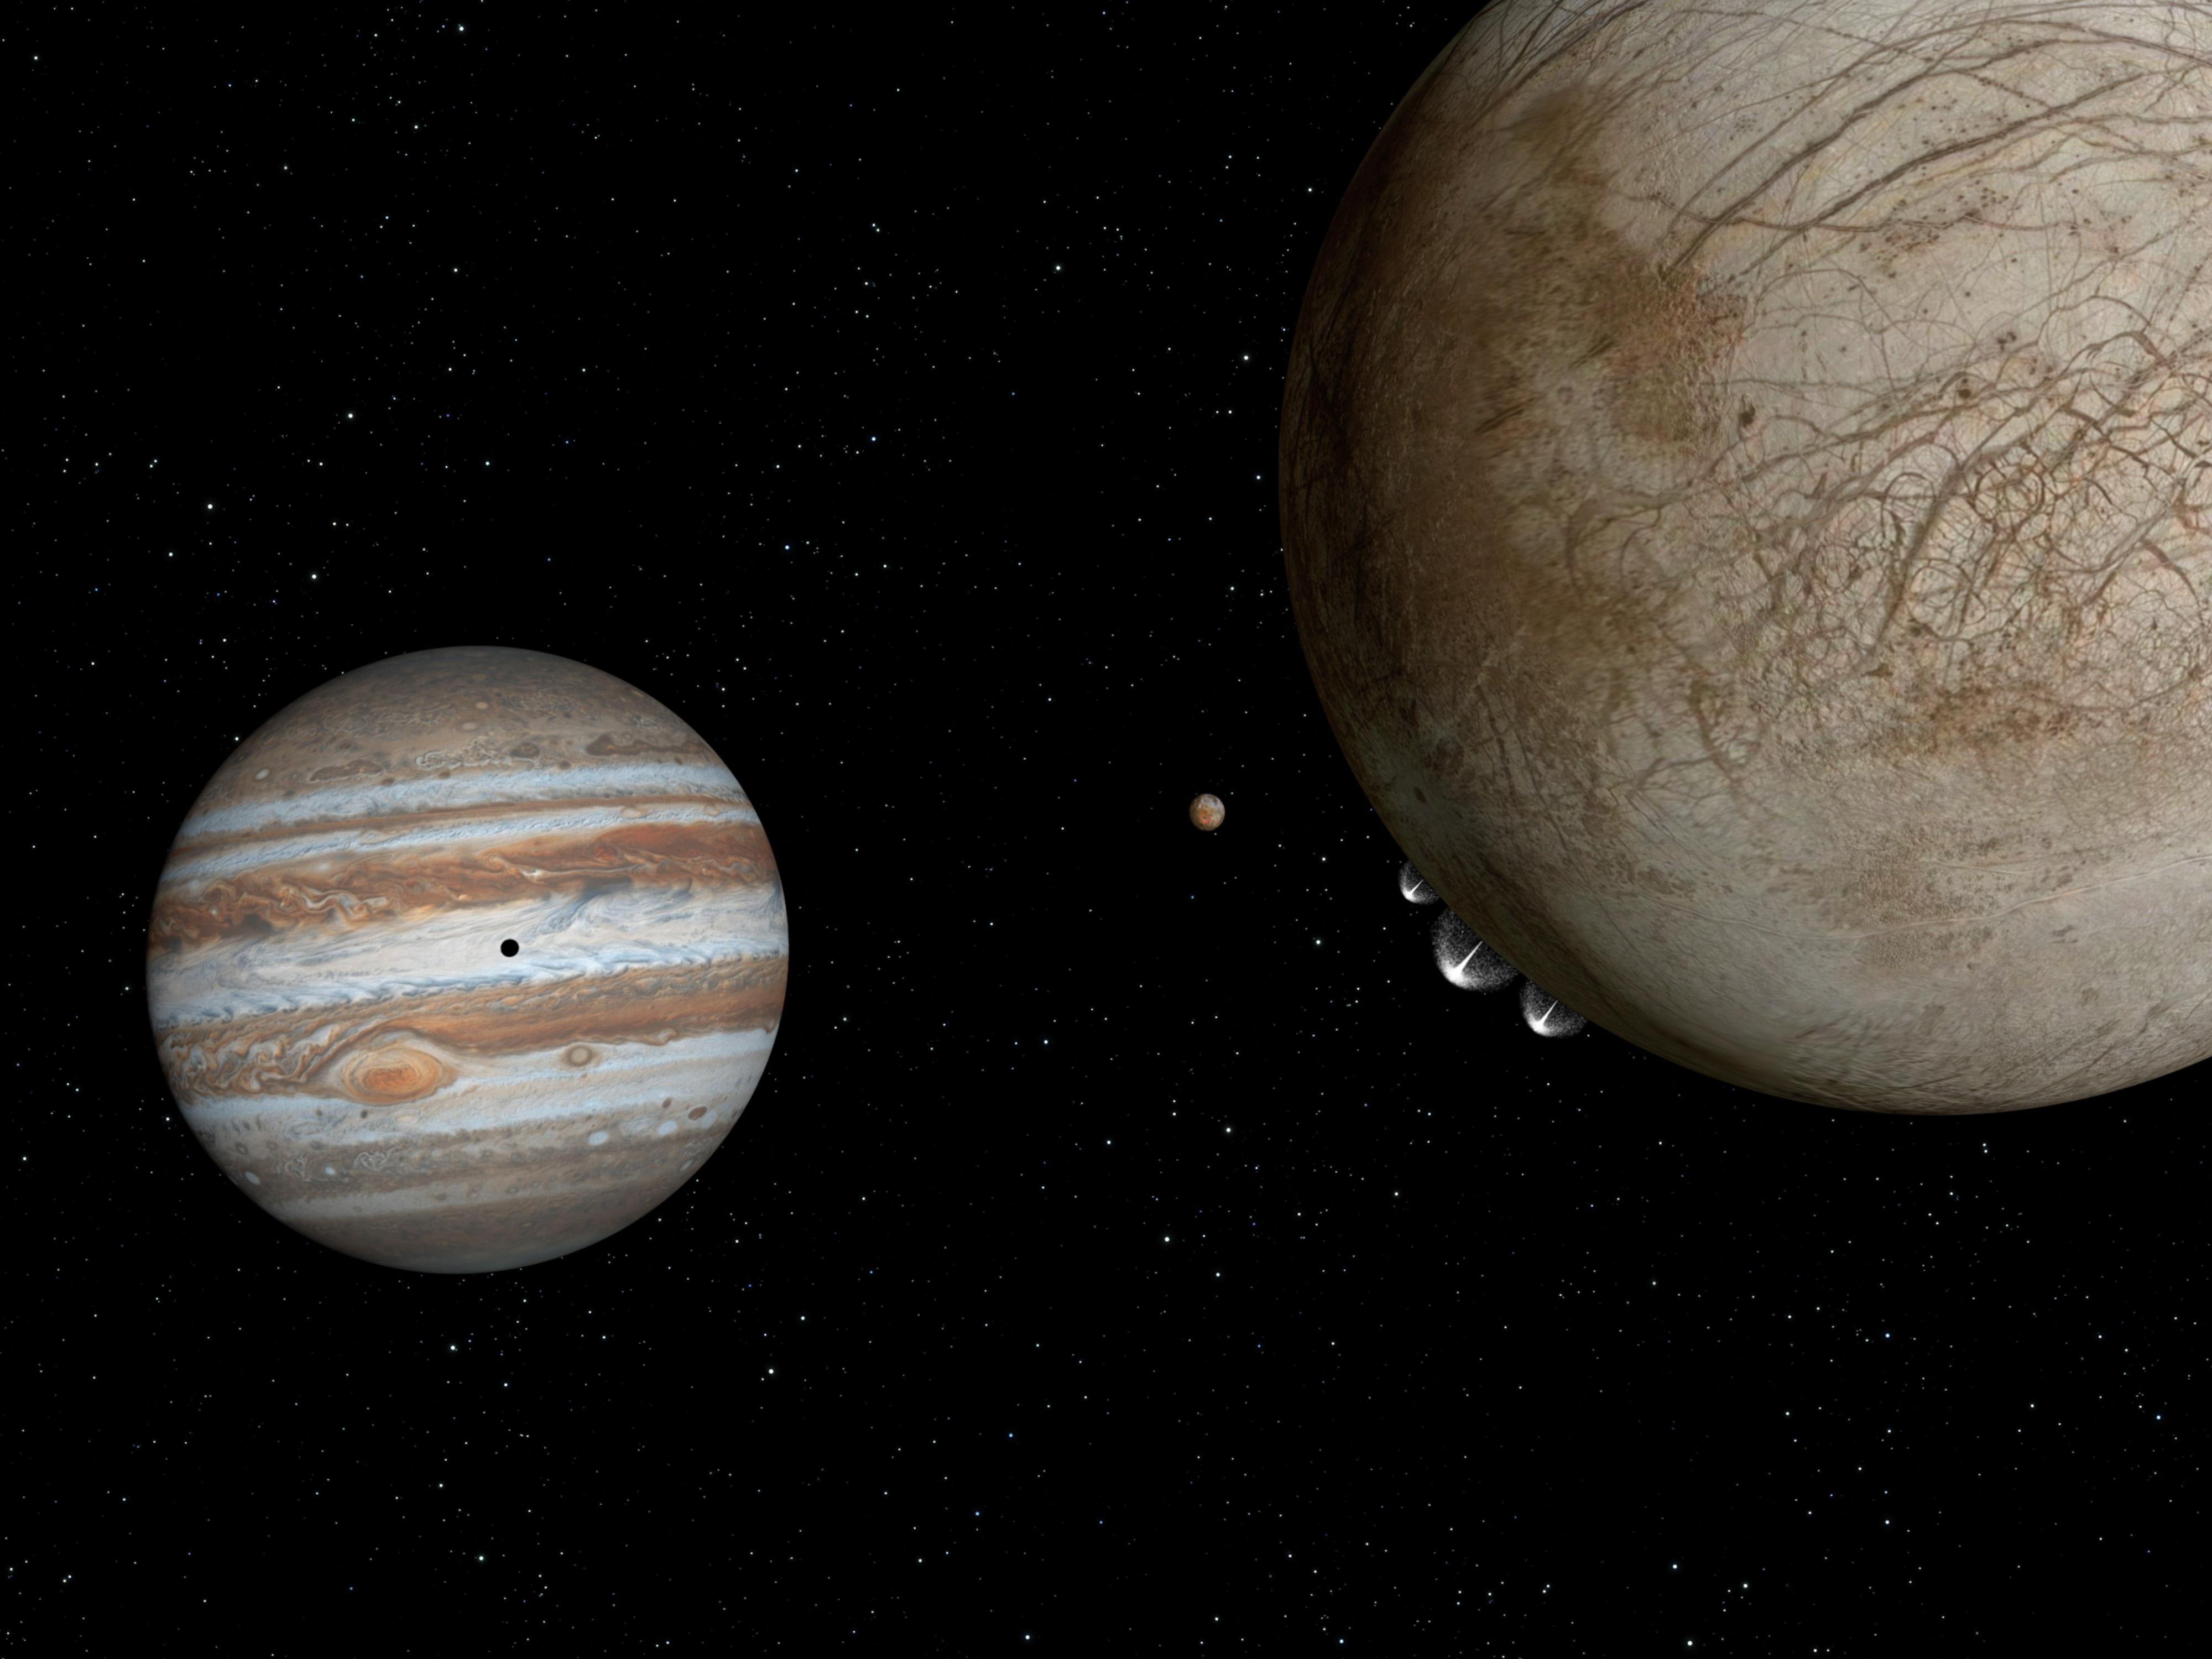 Nasa U2019s Hubble Spots Possible Water Plumes Erupting On Jupiter U0026 39 S Moon Europa